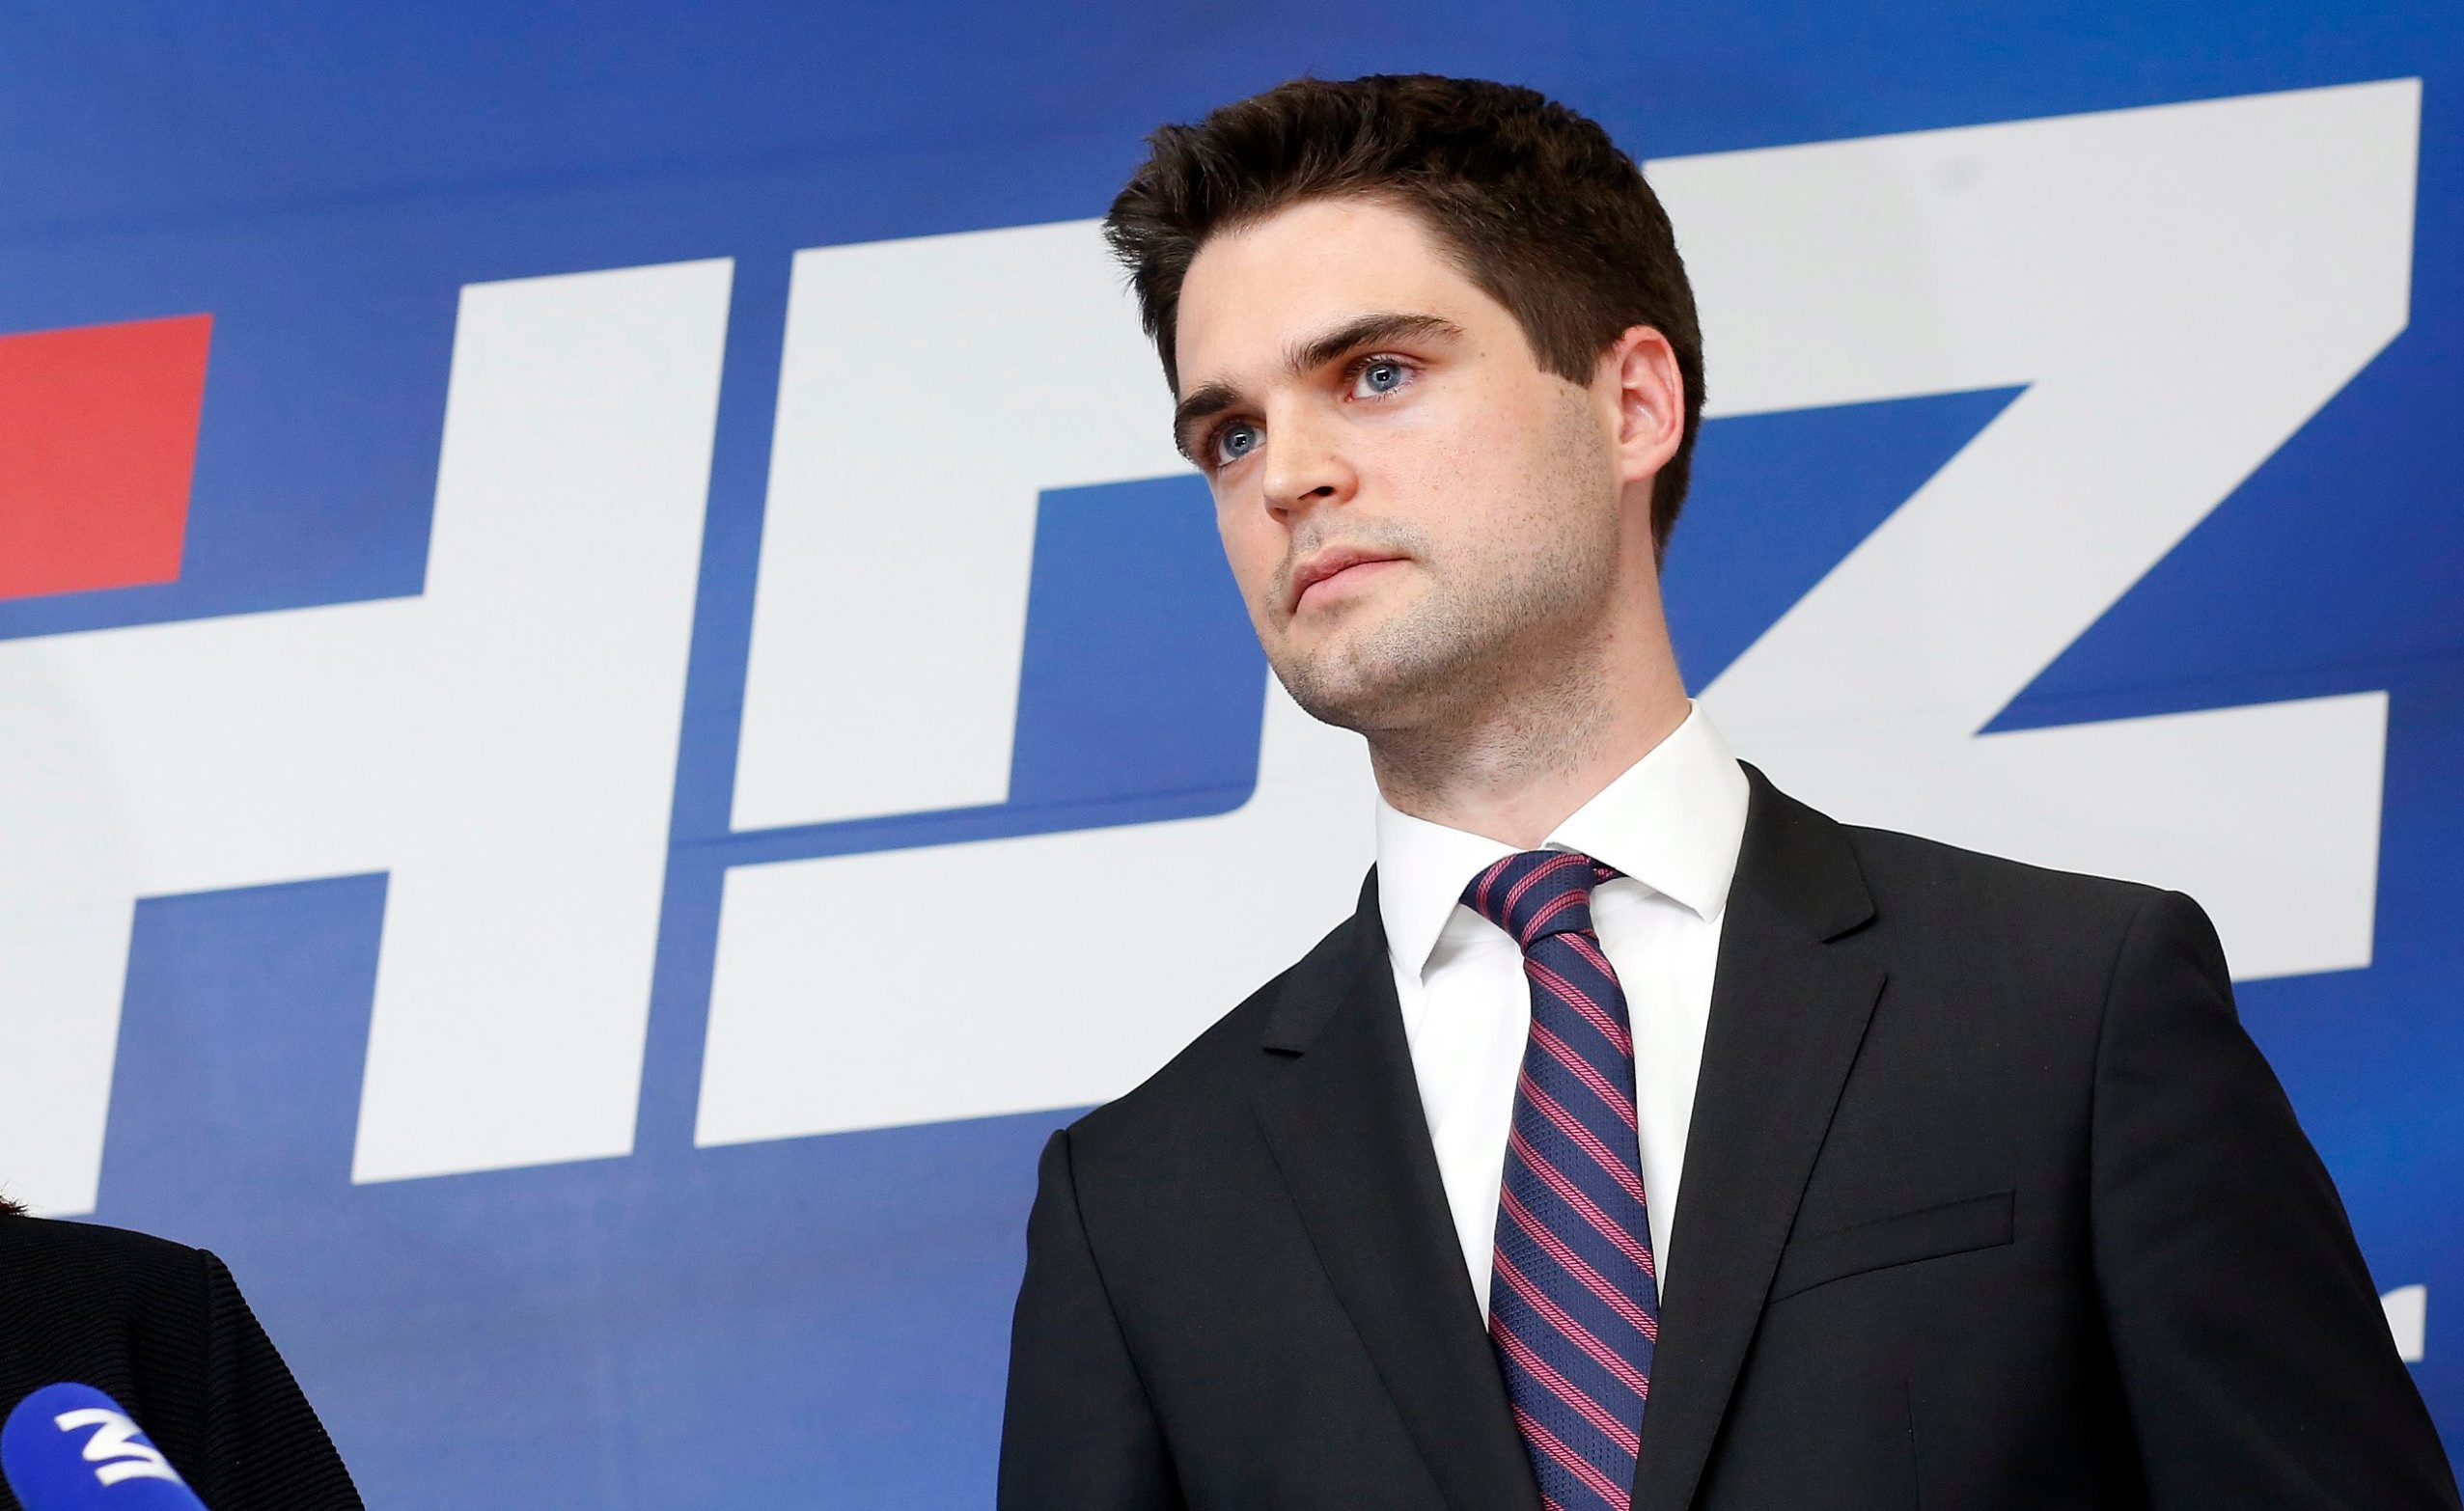 Zastupnik HDZ-a u Europskom parlamentu Karlo Ressler